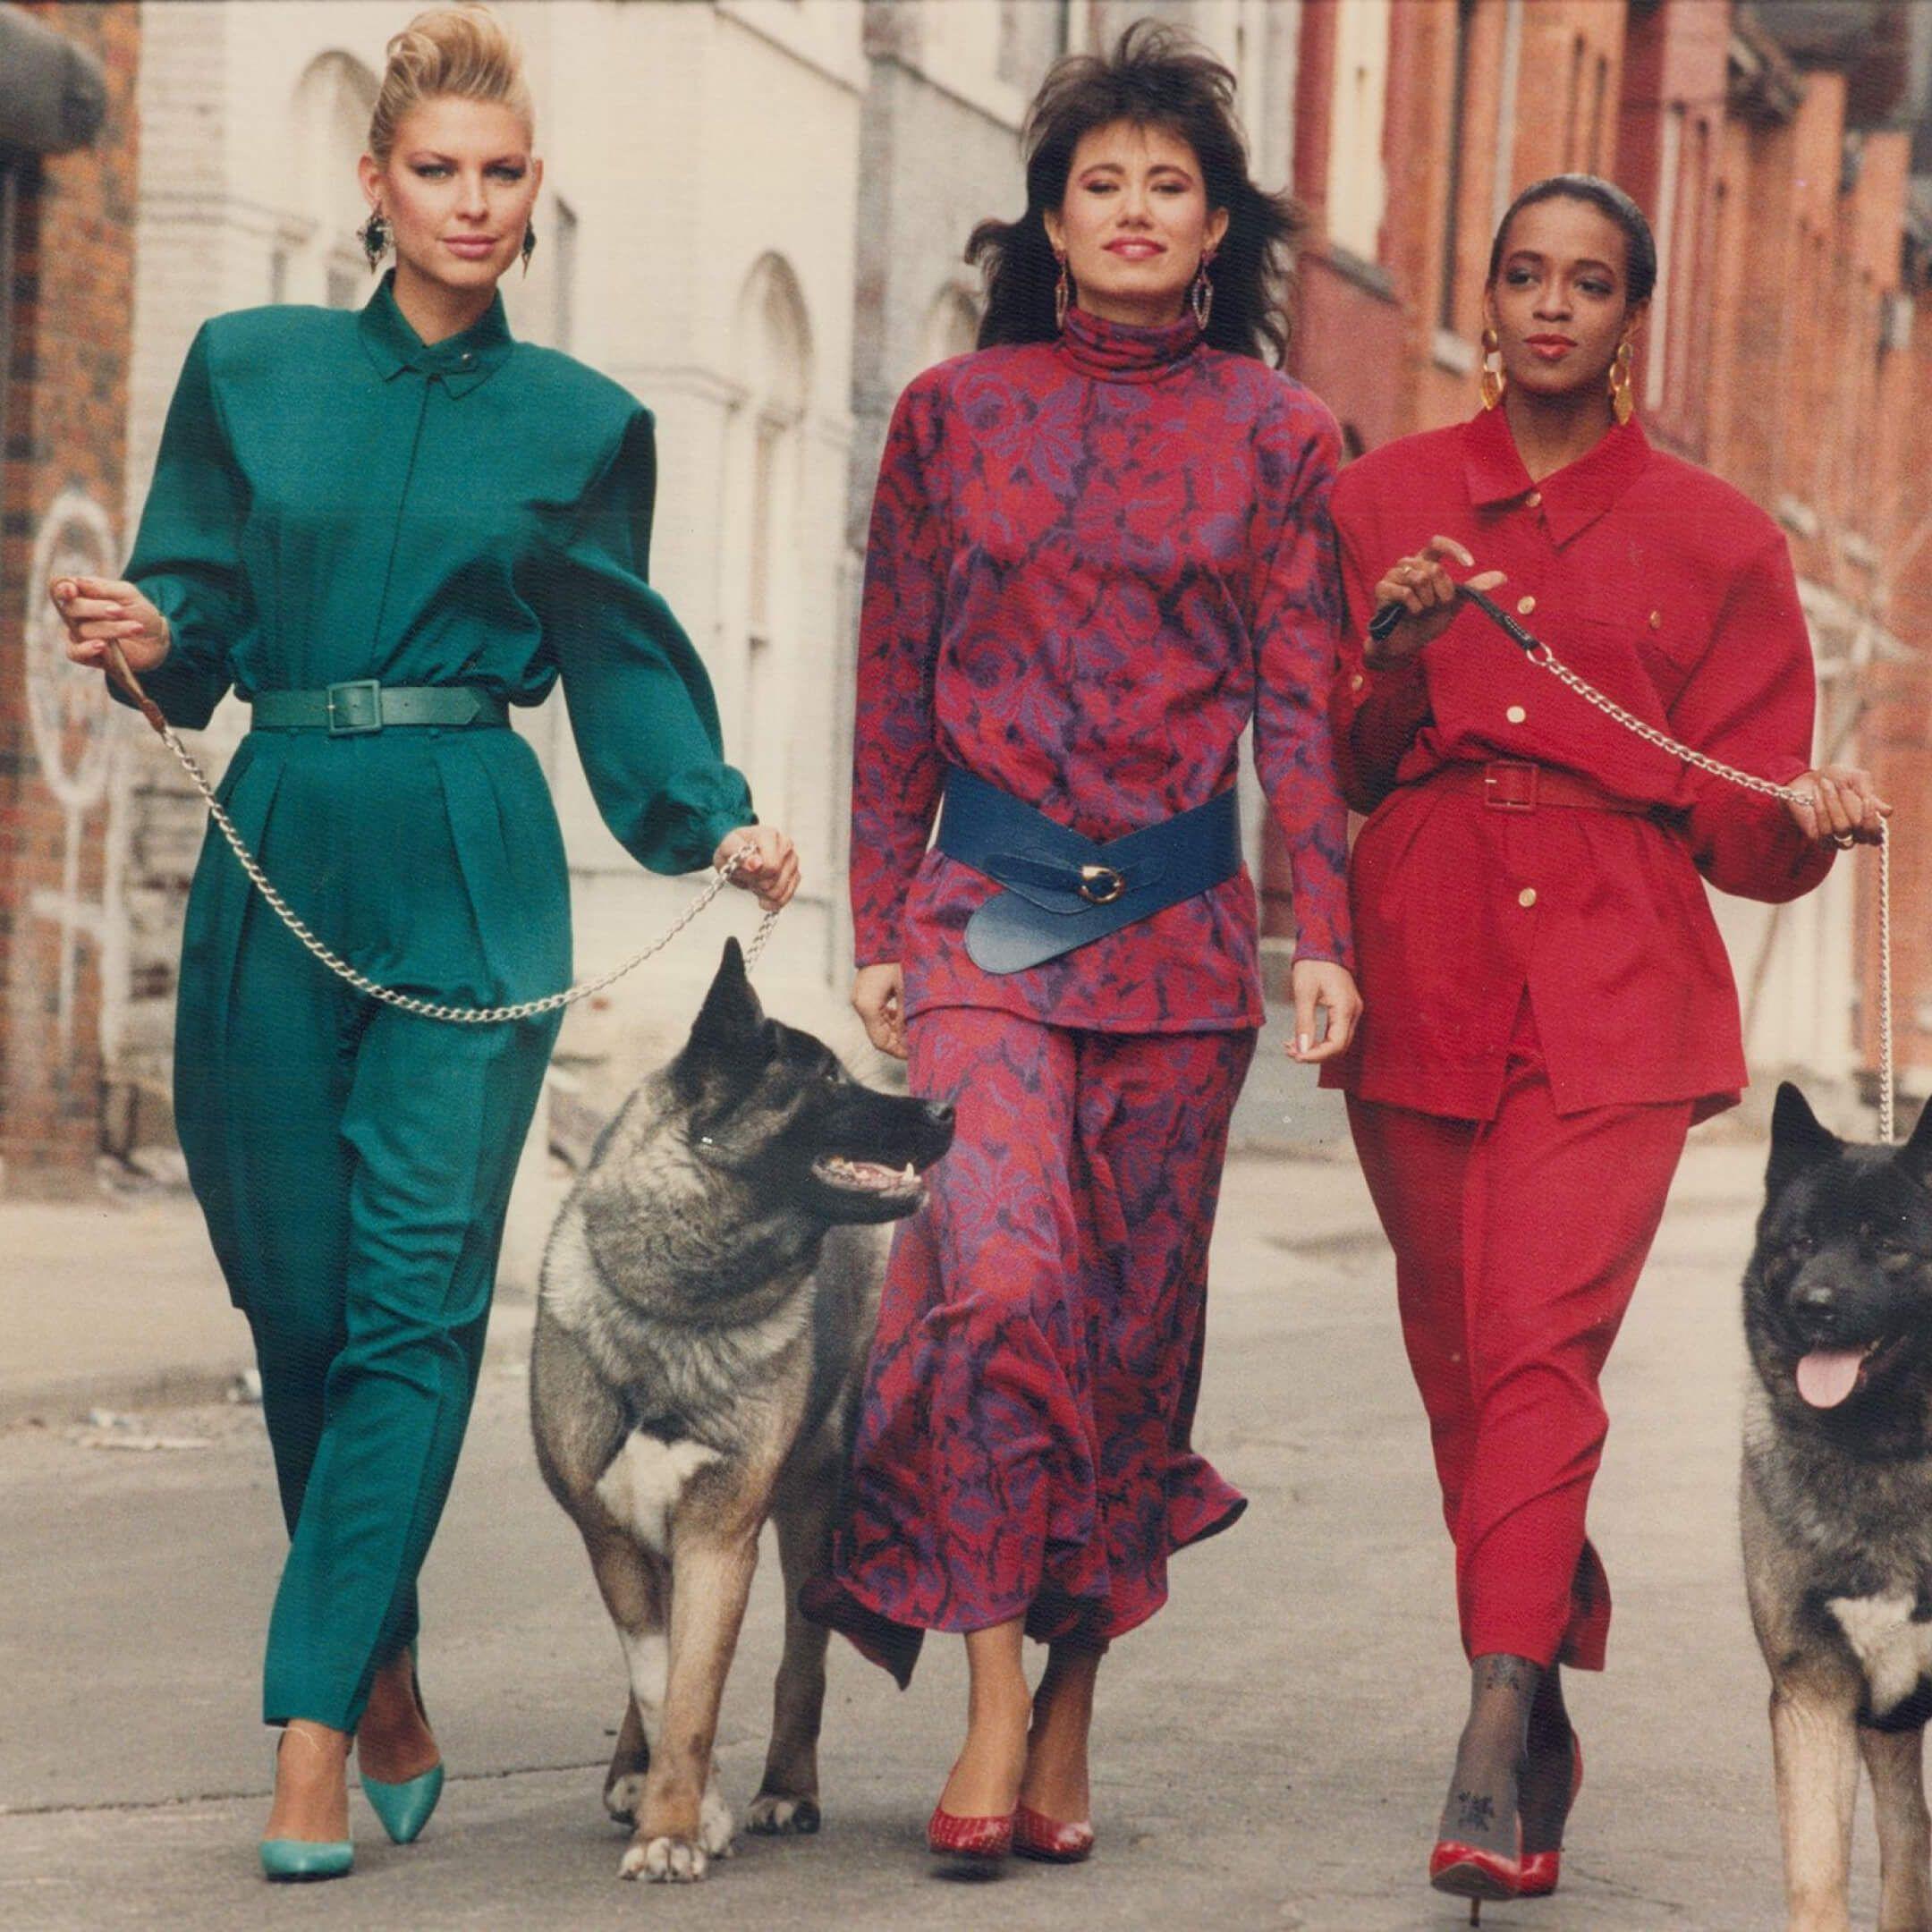 Мода 80-х годов / harpersbazaar.com